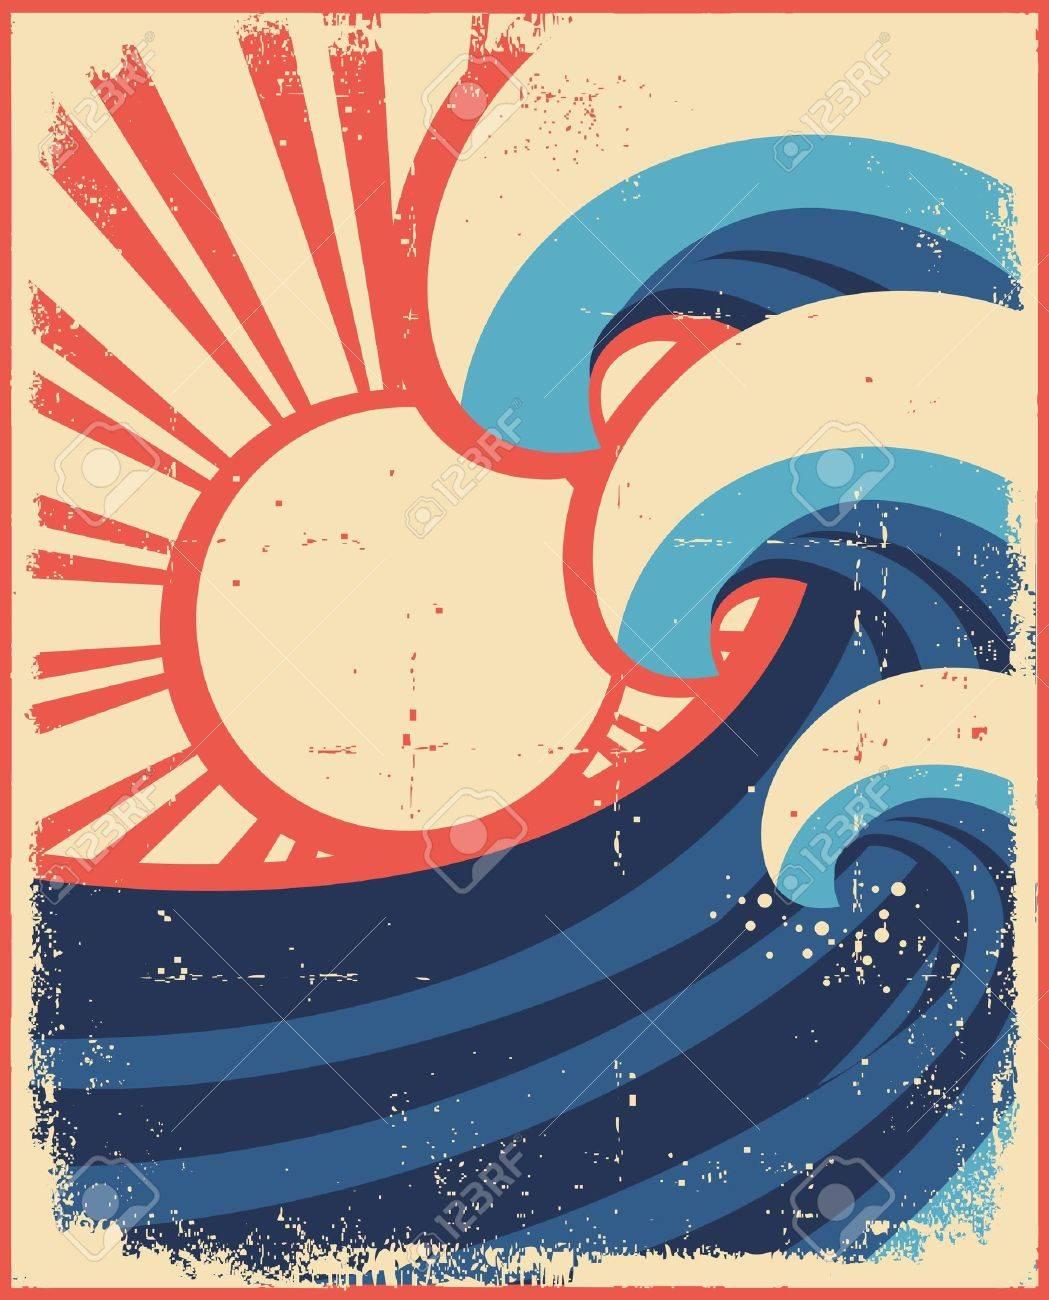 Sea waves poster.Grunge illustration of sea landscape on old paper. Stock Vector - 14976157